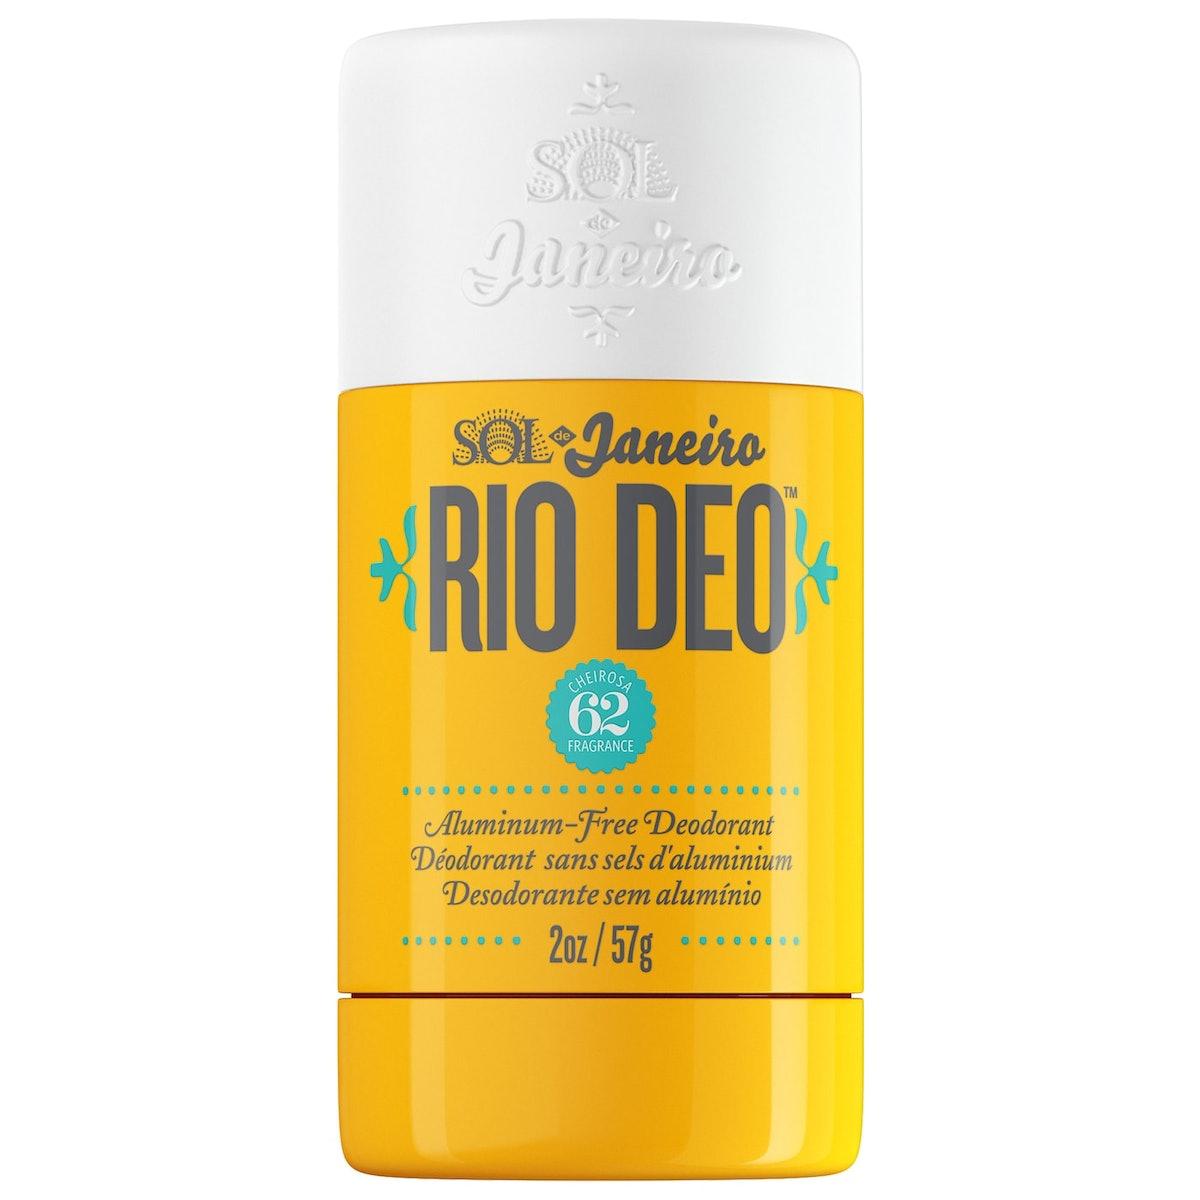 Sol de Janeiro Rio Deo Aluminum-Free Deodorant